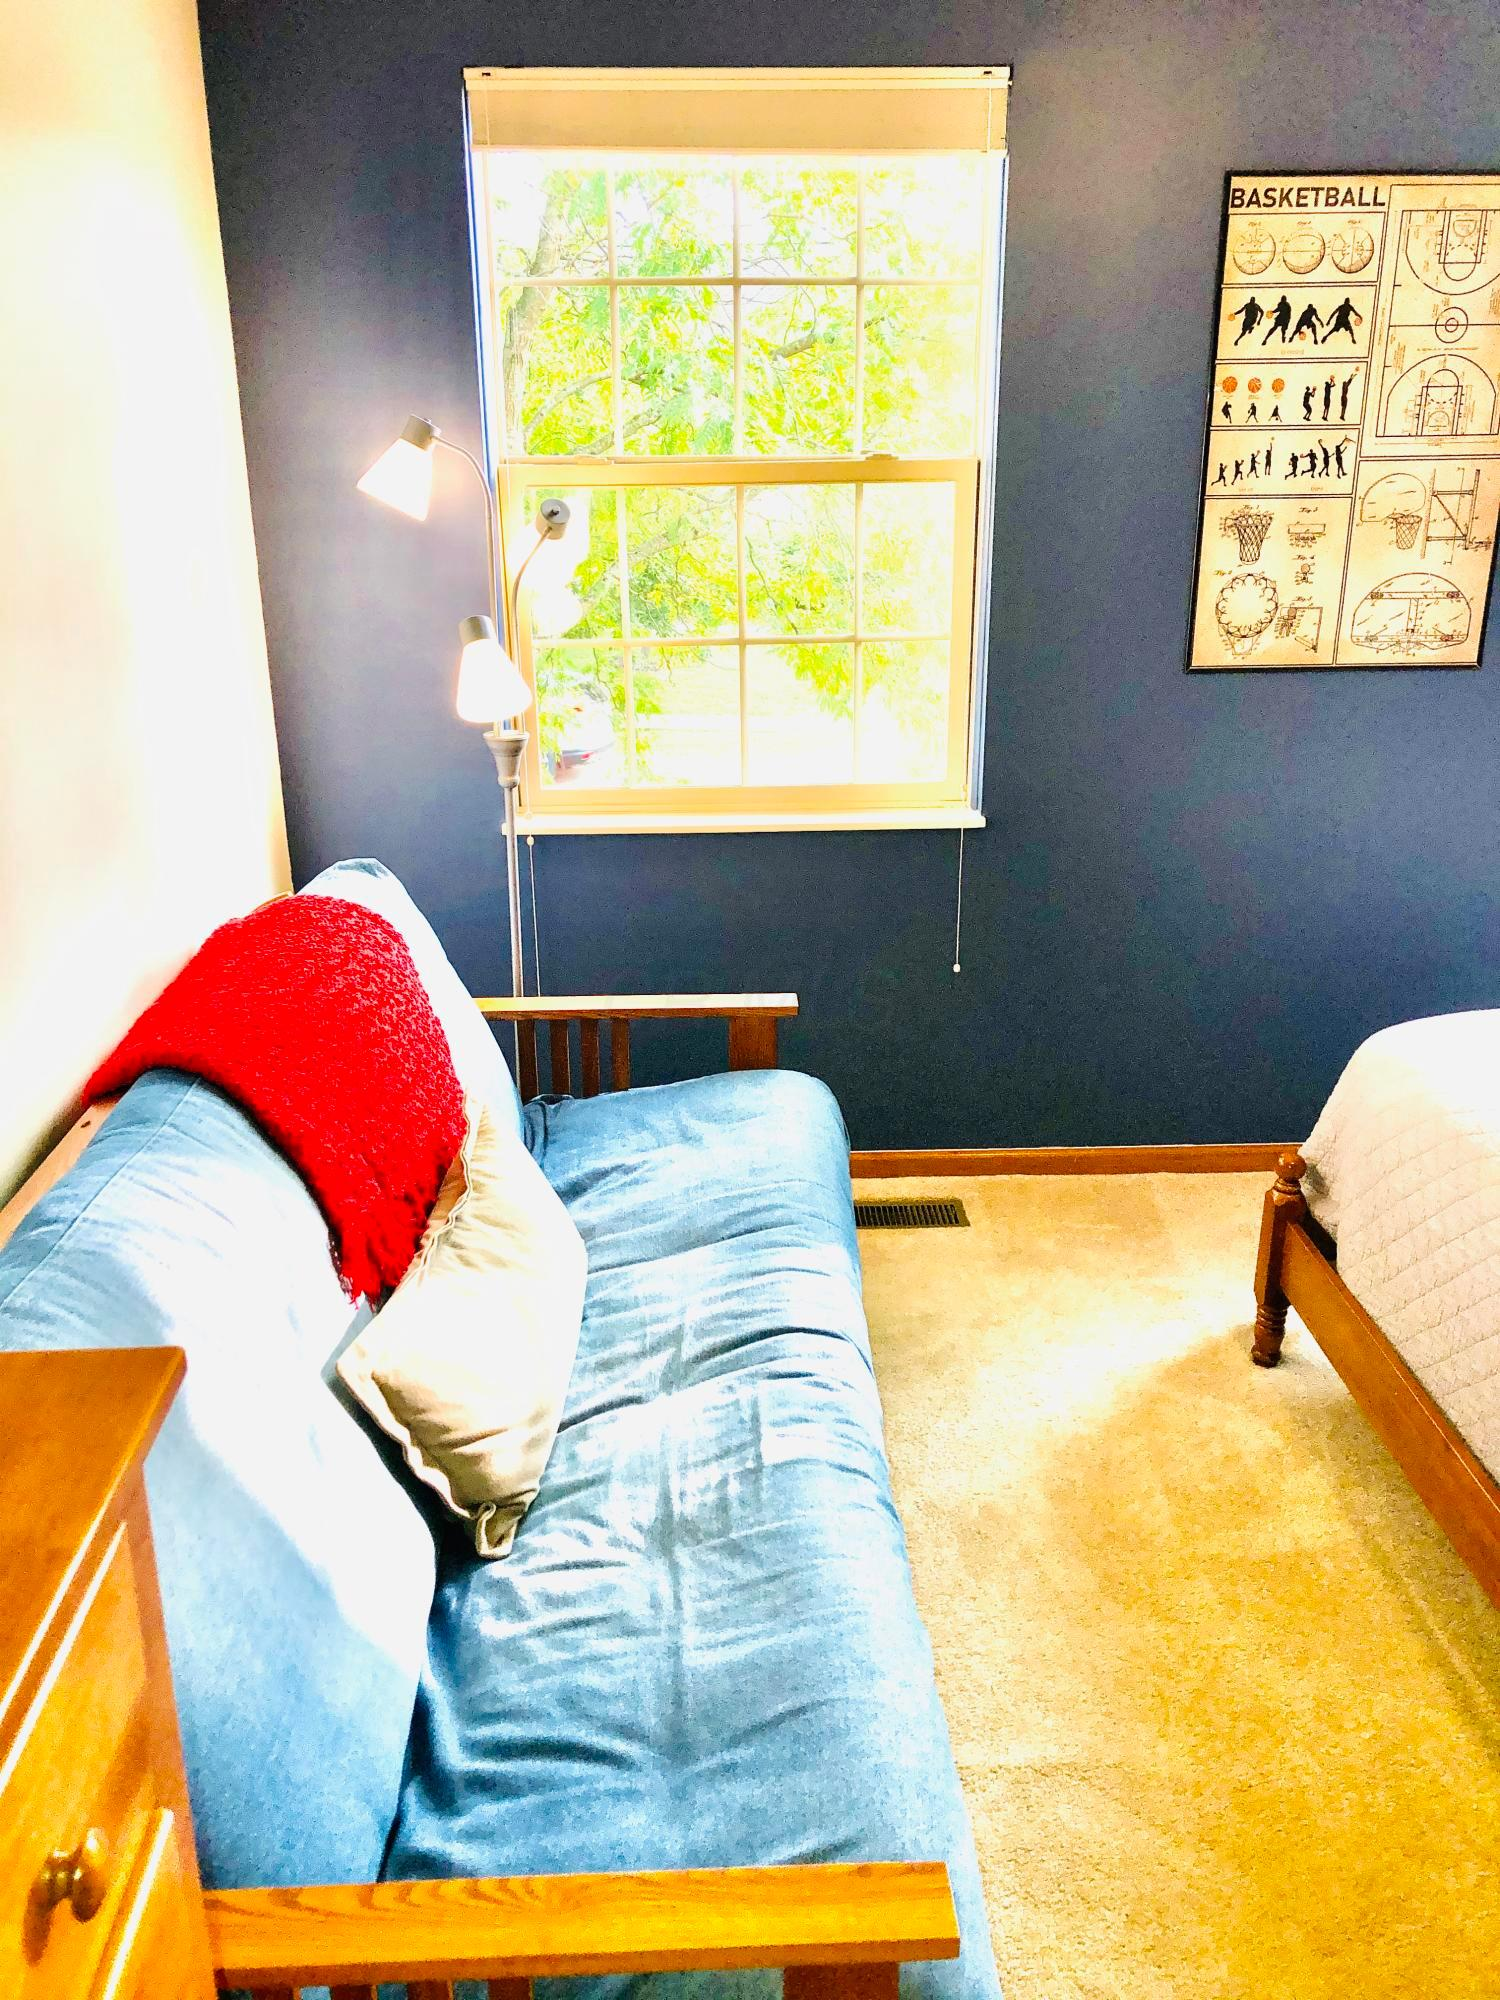 2844 Wynneleaf Street, Hilliard, Ohio 43026, 4 Bedrooms Bedrooms, ,3 BathroomsBathrooms,Residential,For Sale,Wynneleaf,220032177